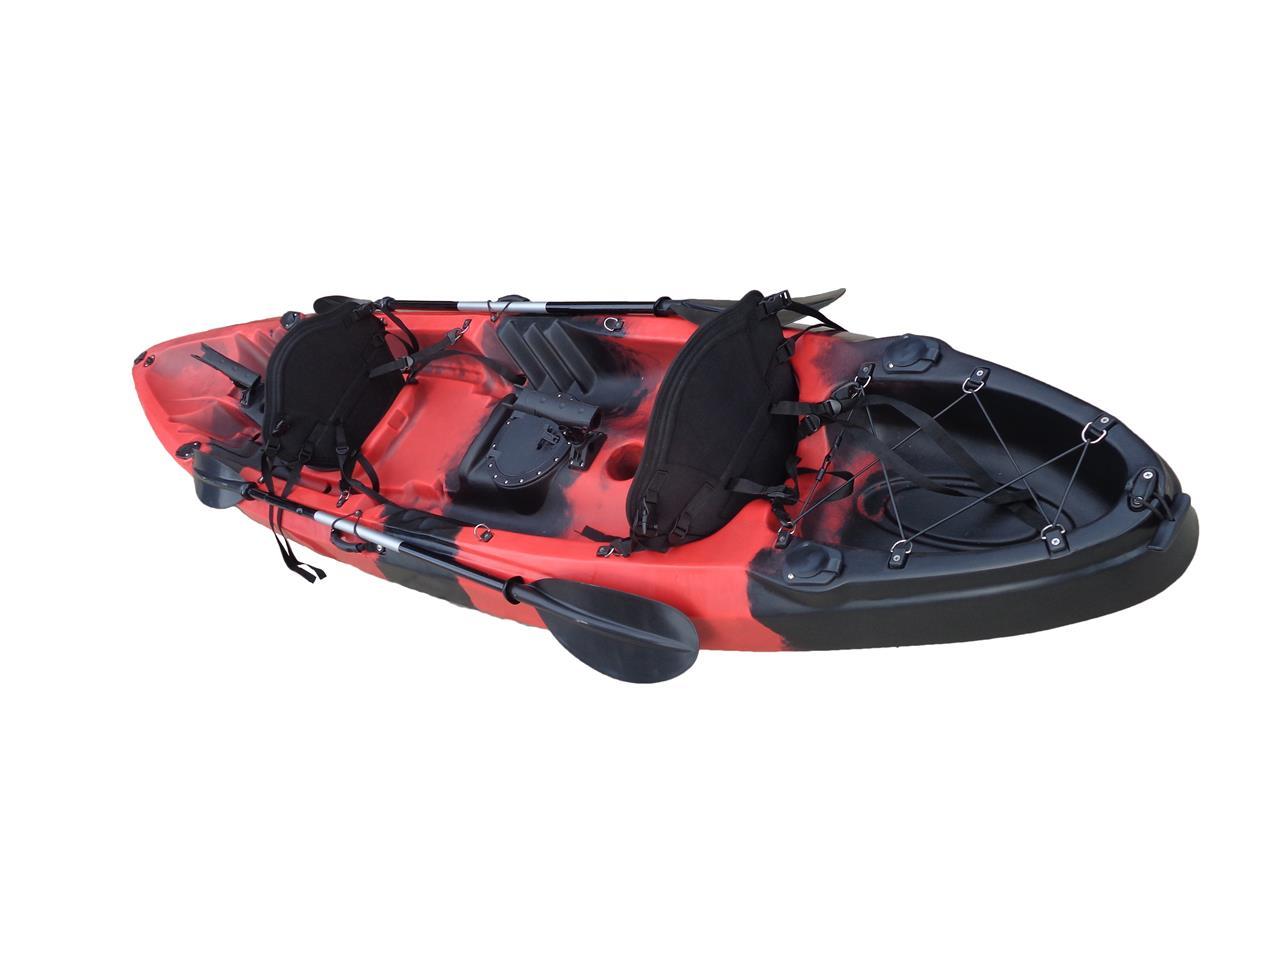 Double kayak single fishing kayak tandem kayak ocean canoe for Double fishing kayak